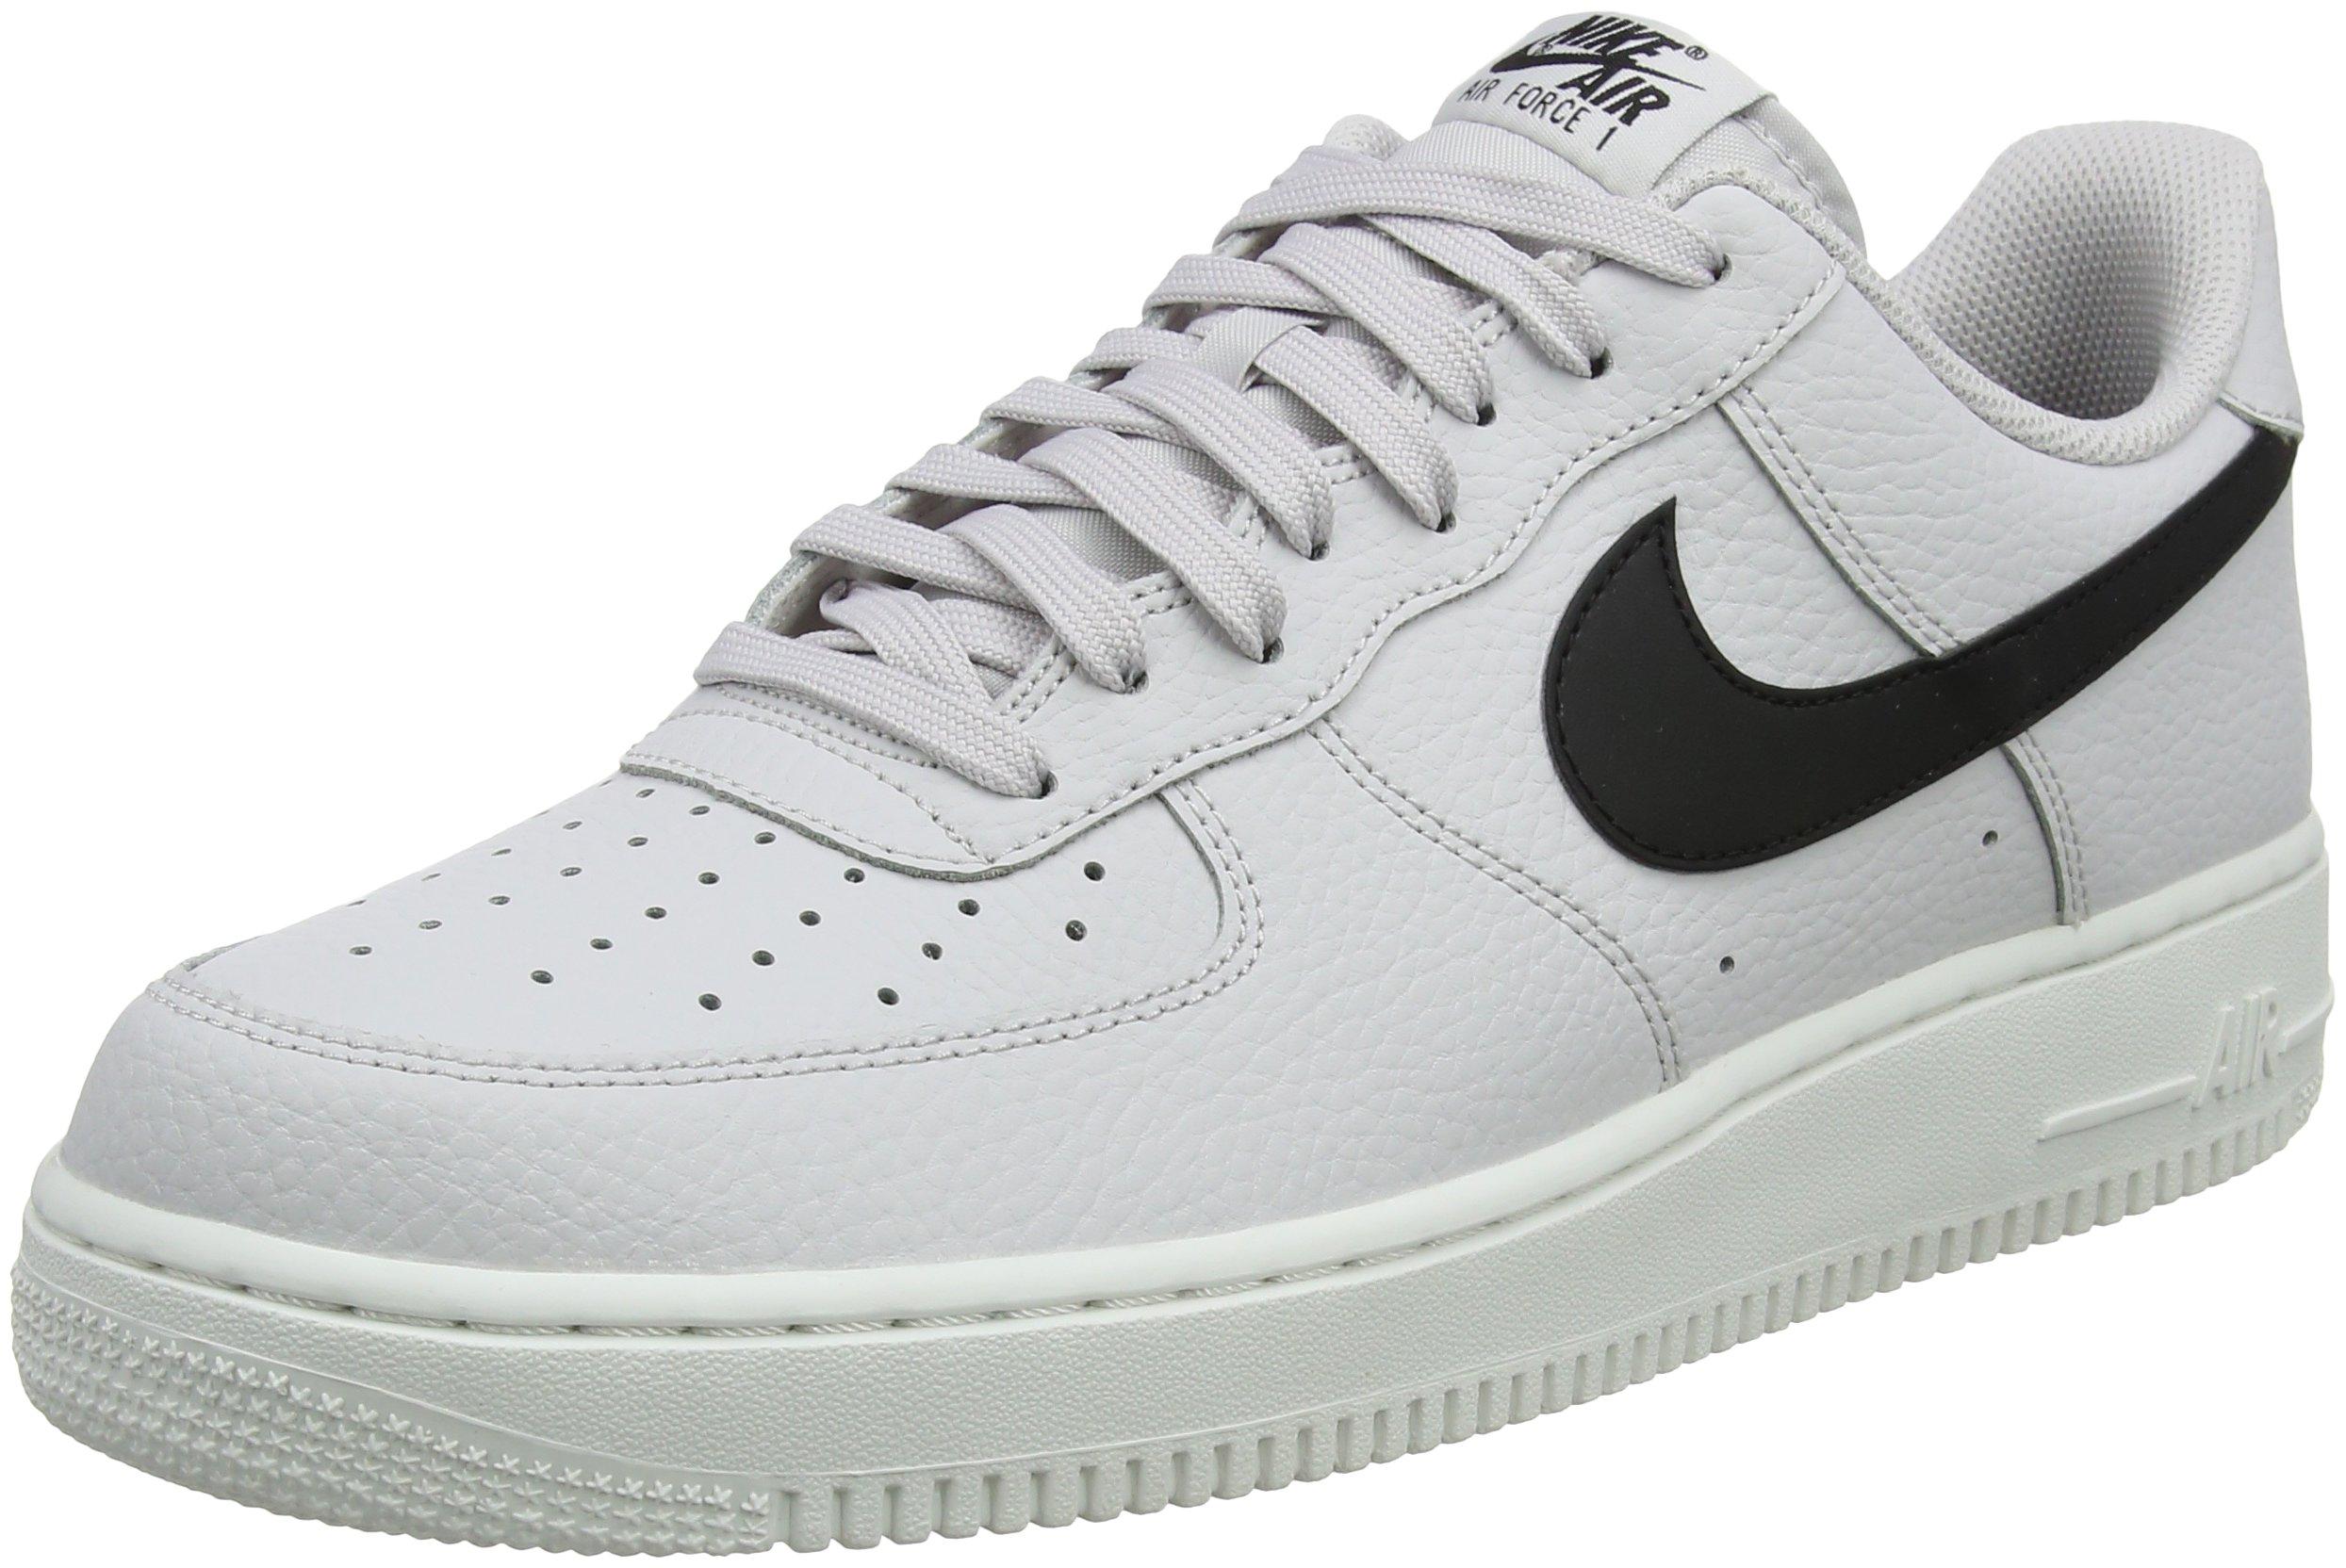 Nike Men's Air Force 1 '07 Low-Top Sneakers, White (Vast Grey/Black-Summit  White 008), 9.5 UK 44.5 EU on Galleon Philippines